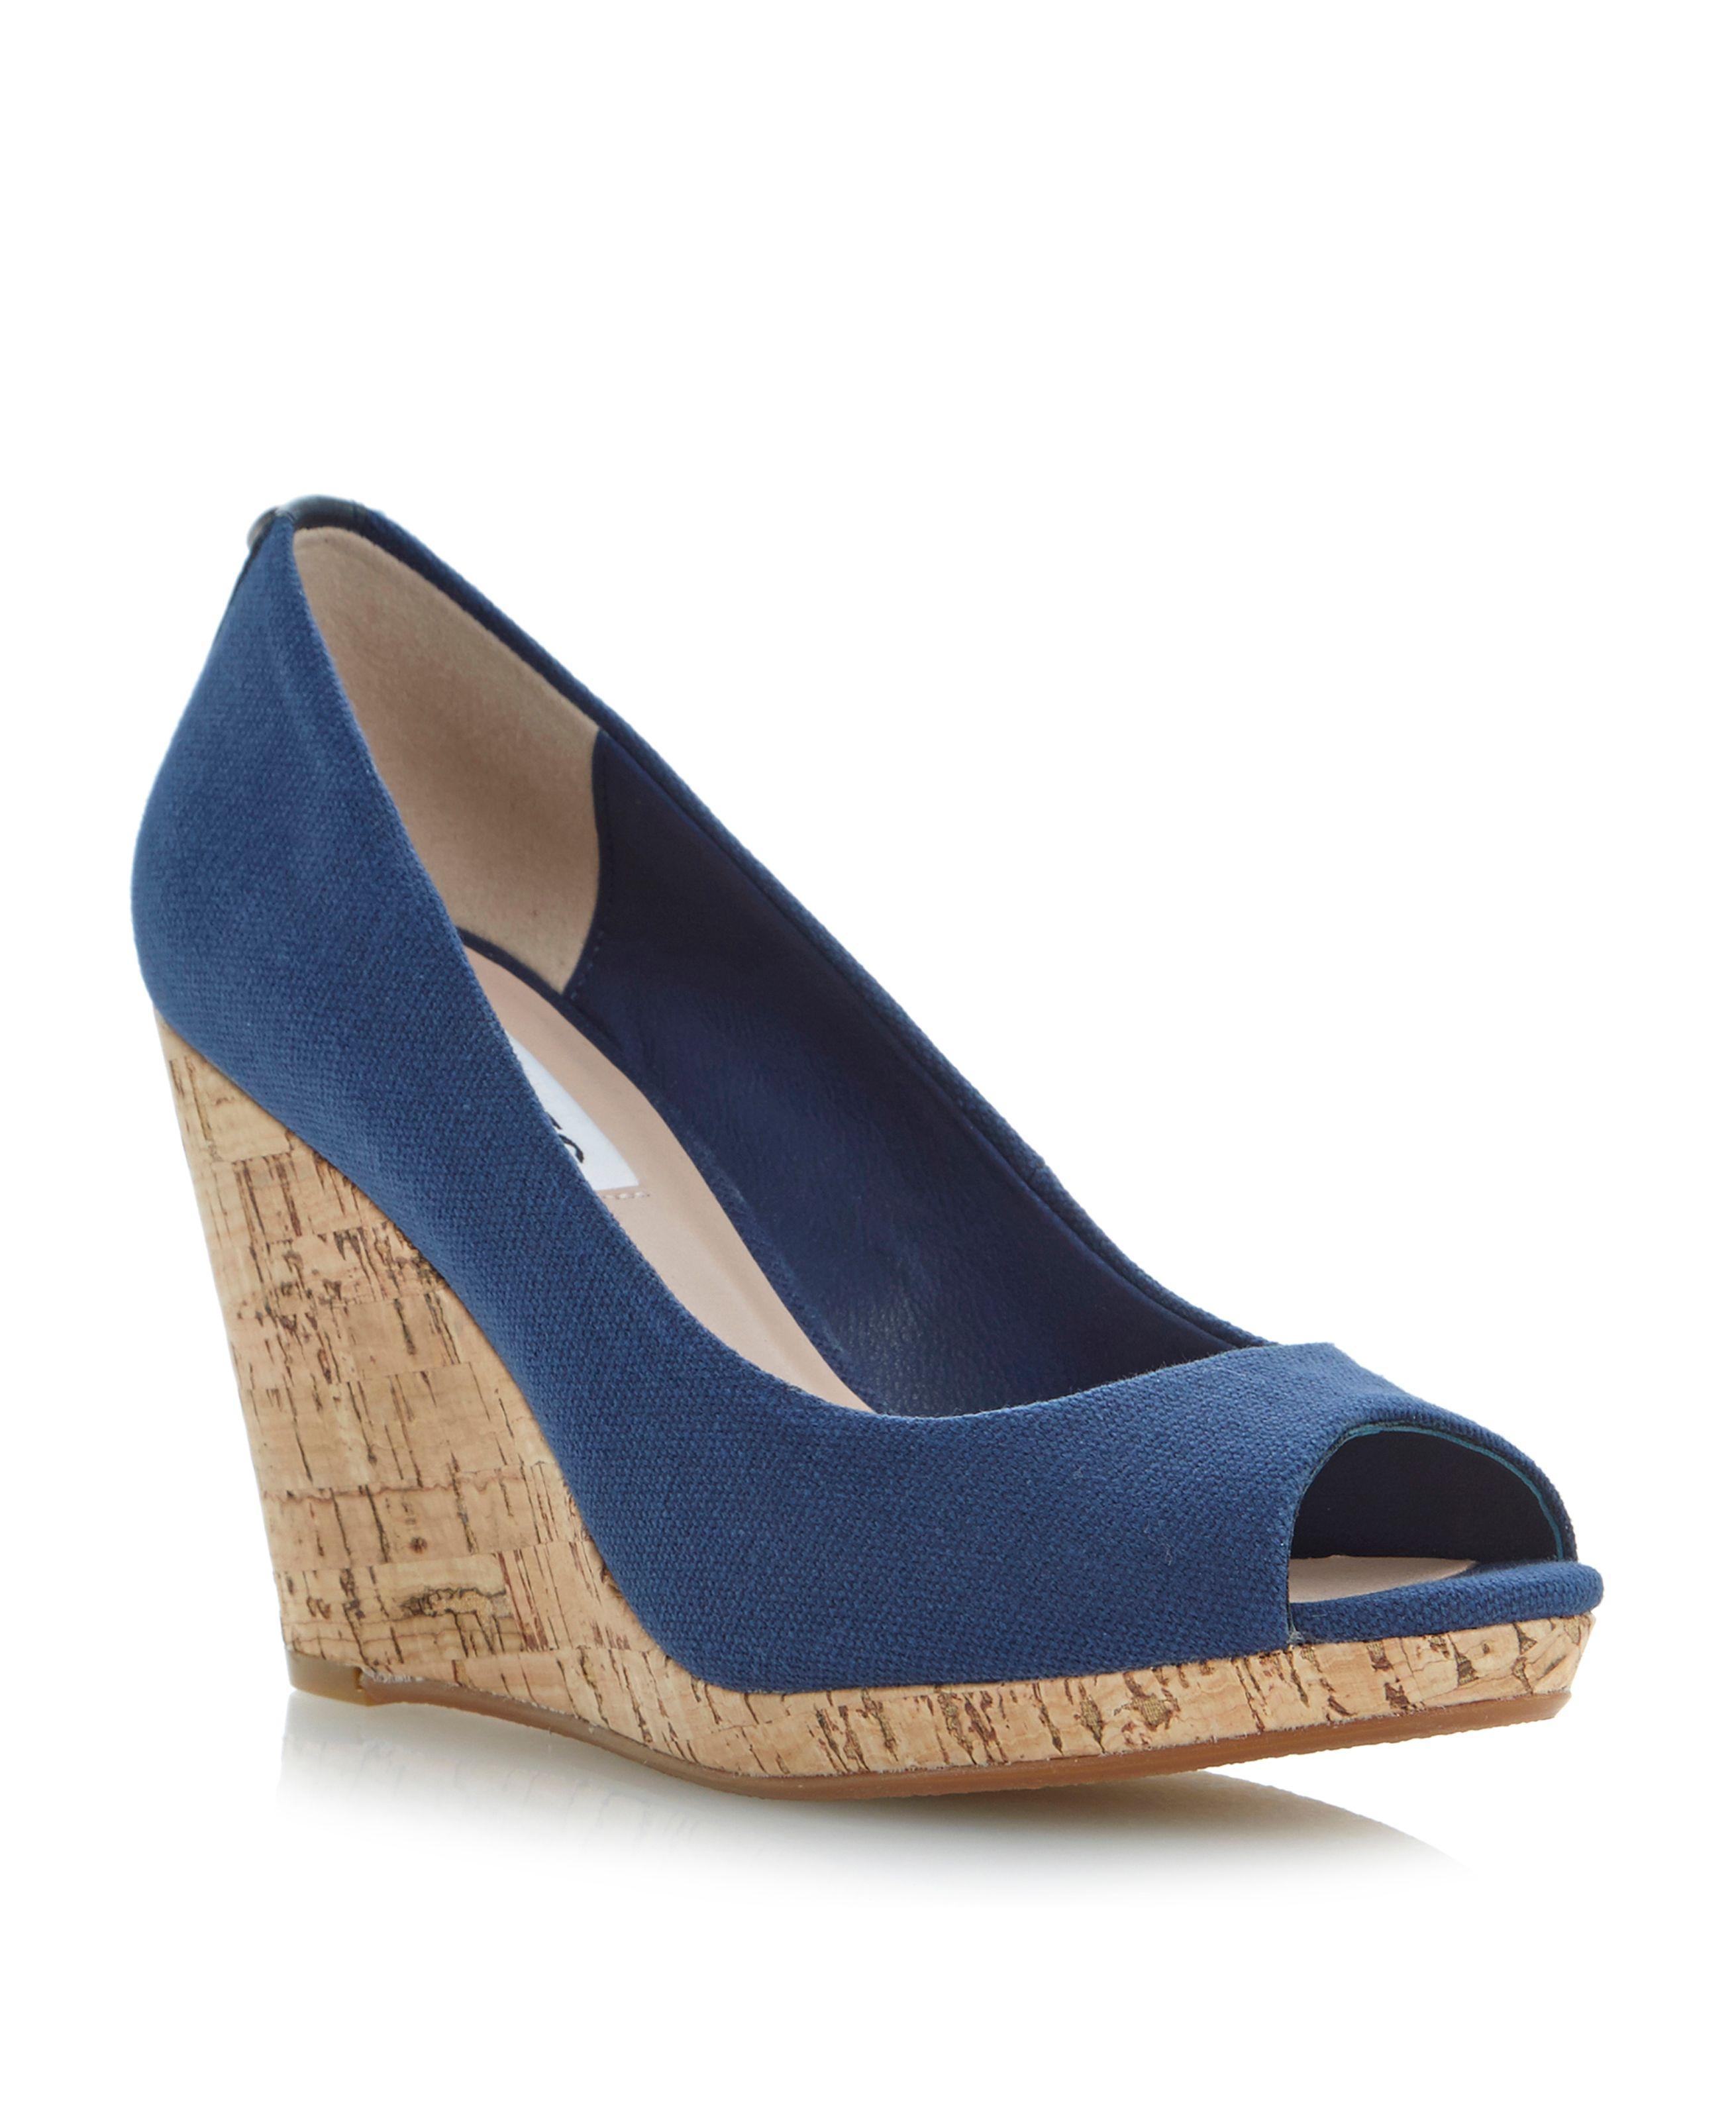 dune celia peeptoe wedge court shoes in blue navy lyst